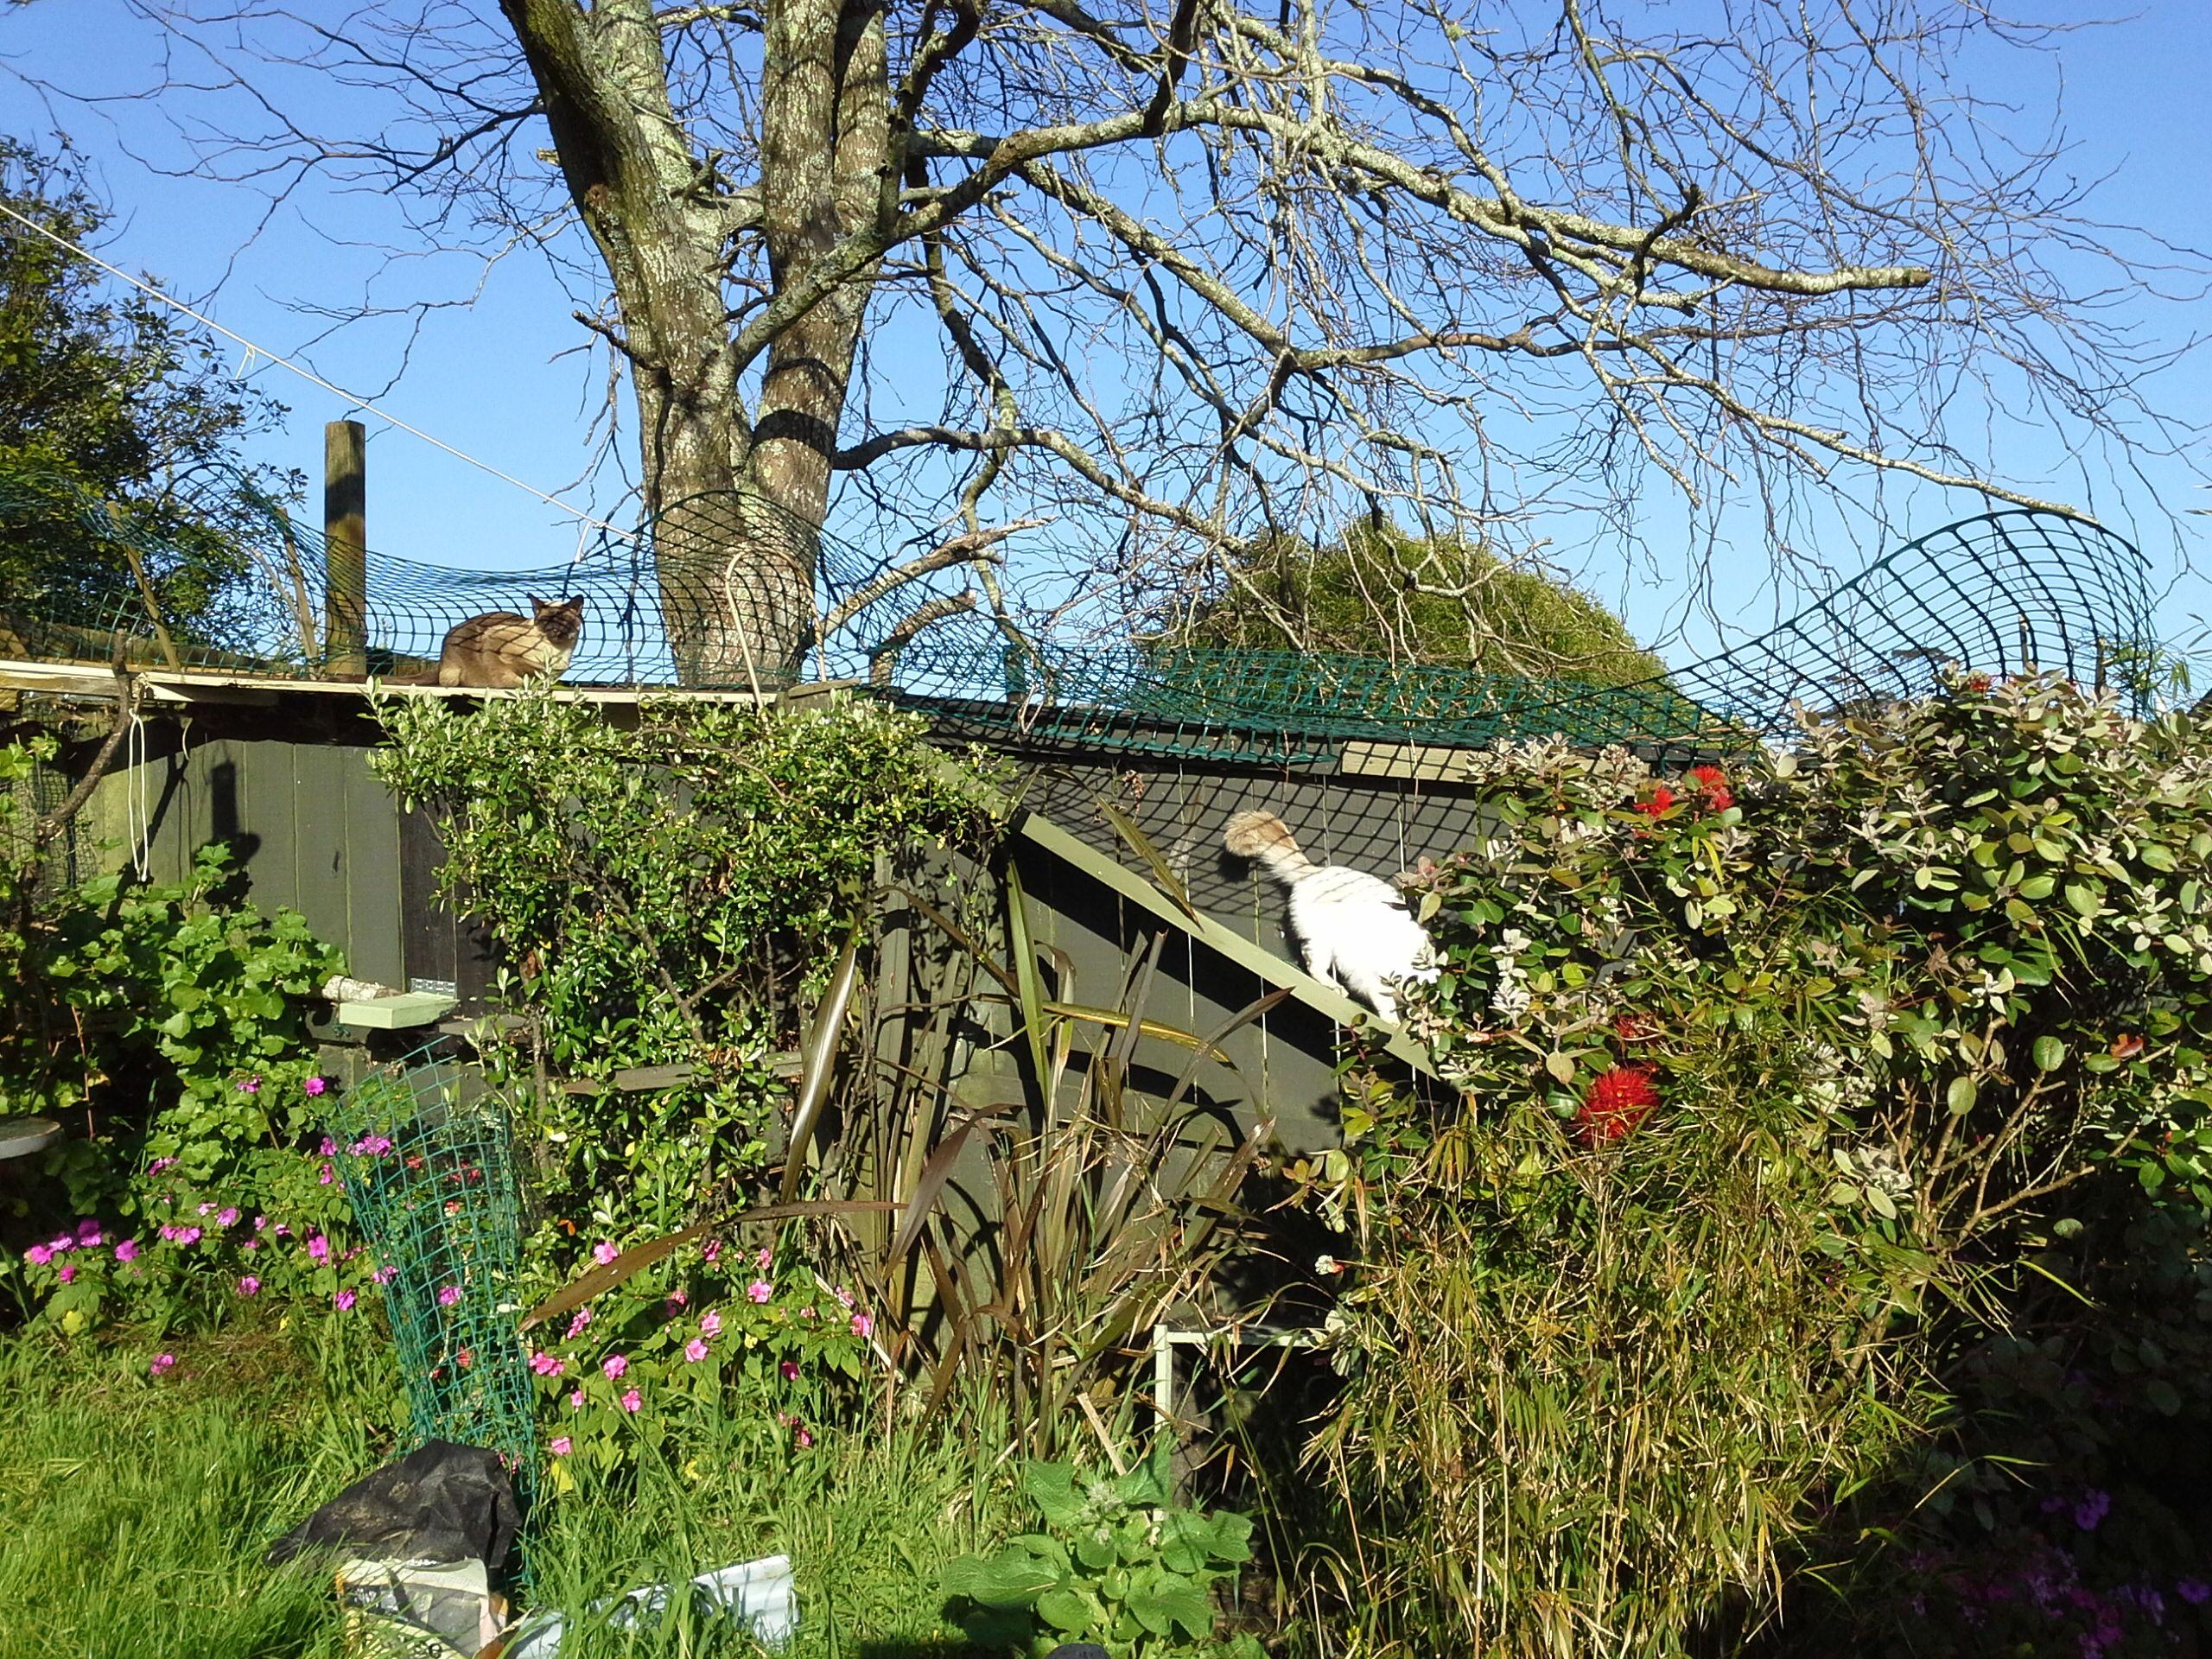 Diy catproof fencing and backyard playground backyard